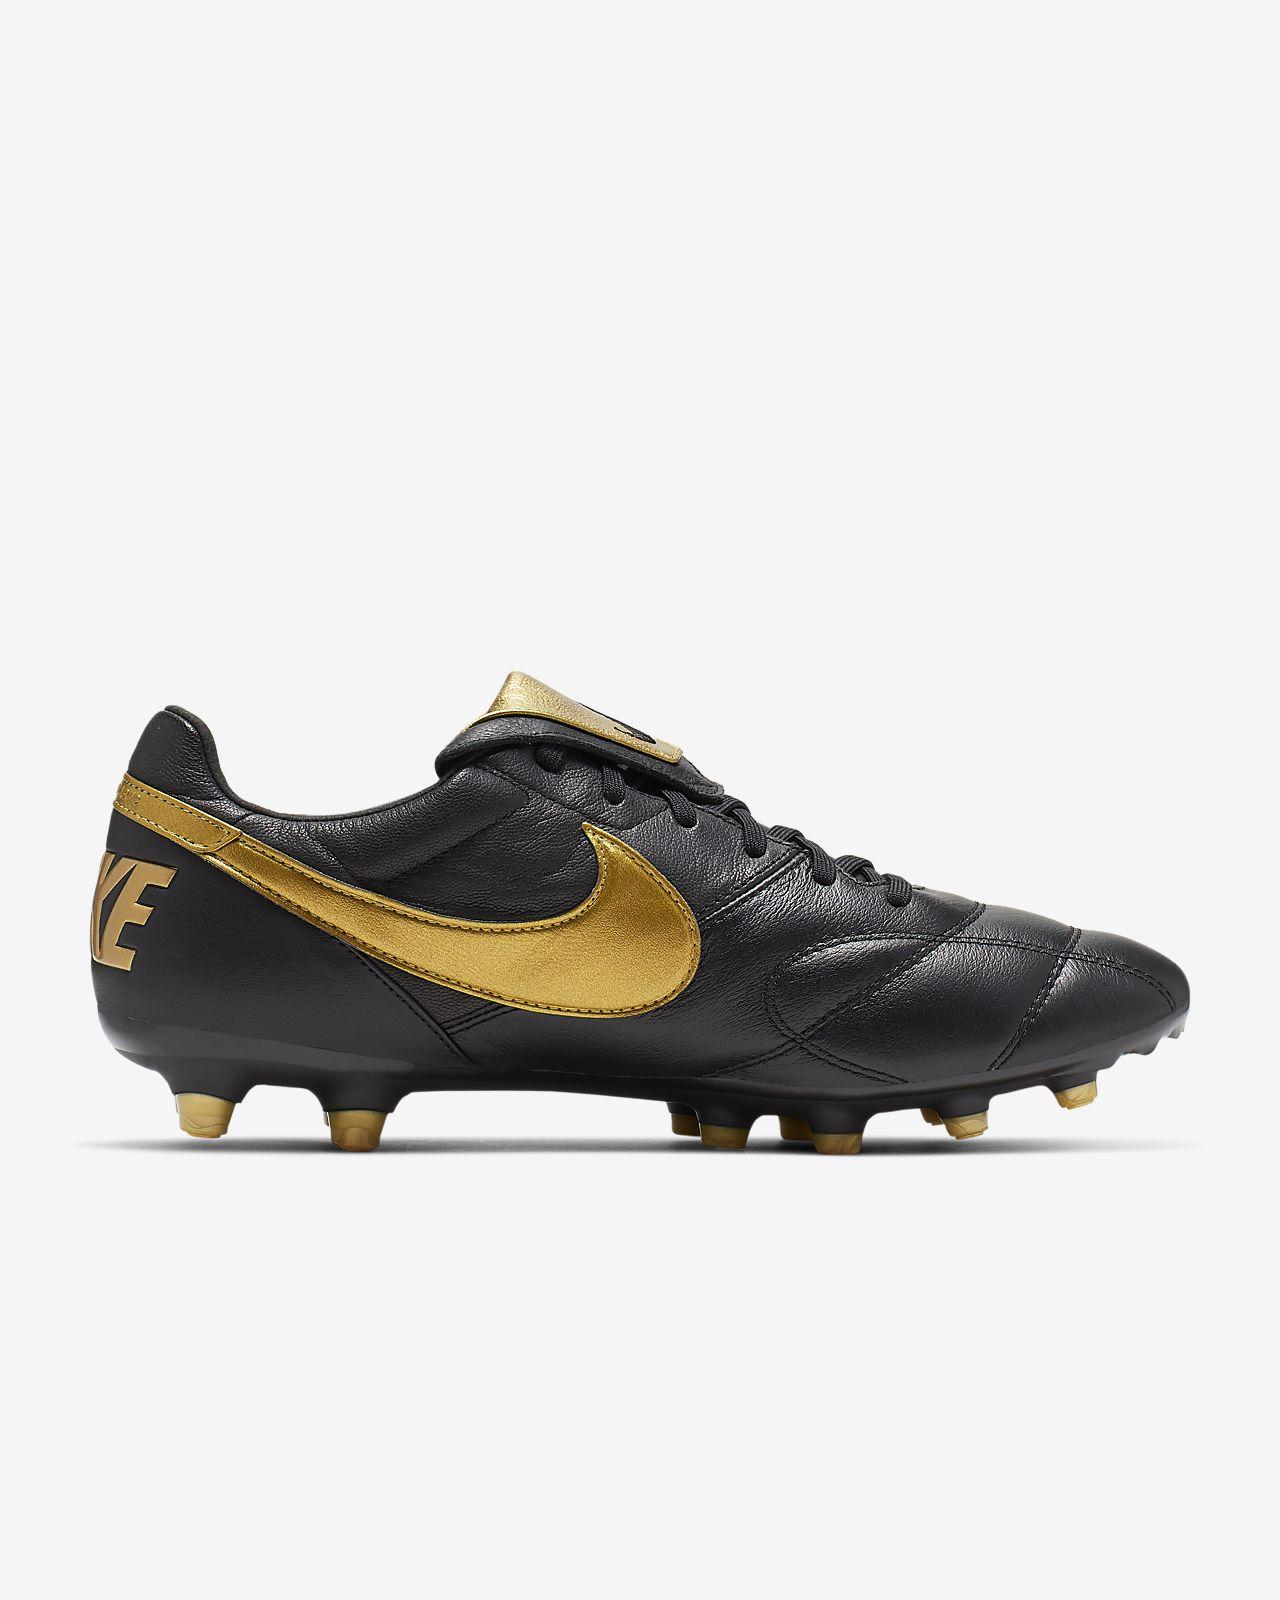 fbb04cd6ca81 Nike Premier II FG Firm-Ground Football Boot. Nike.com AU